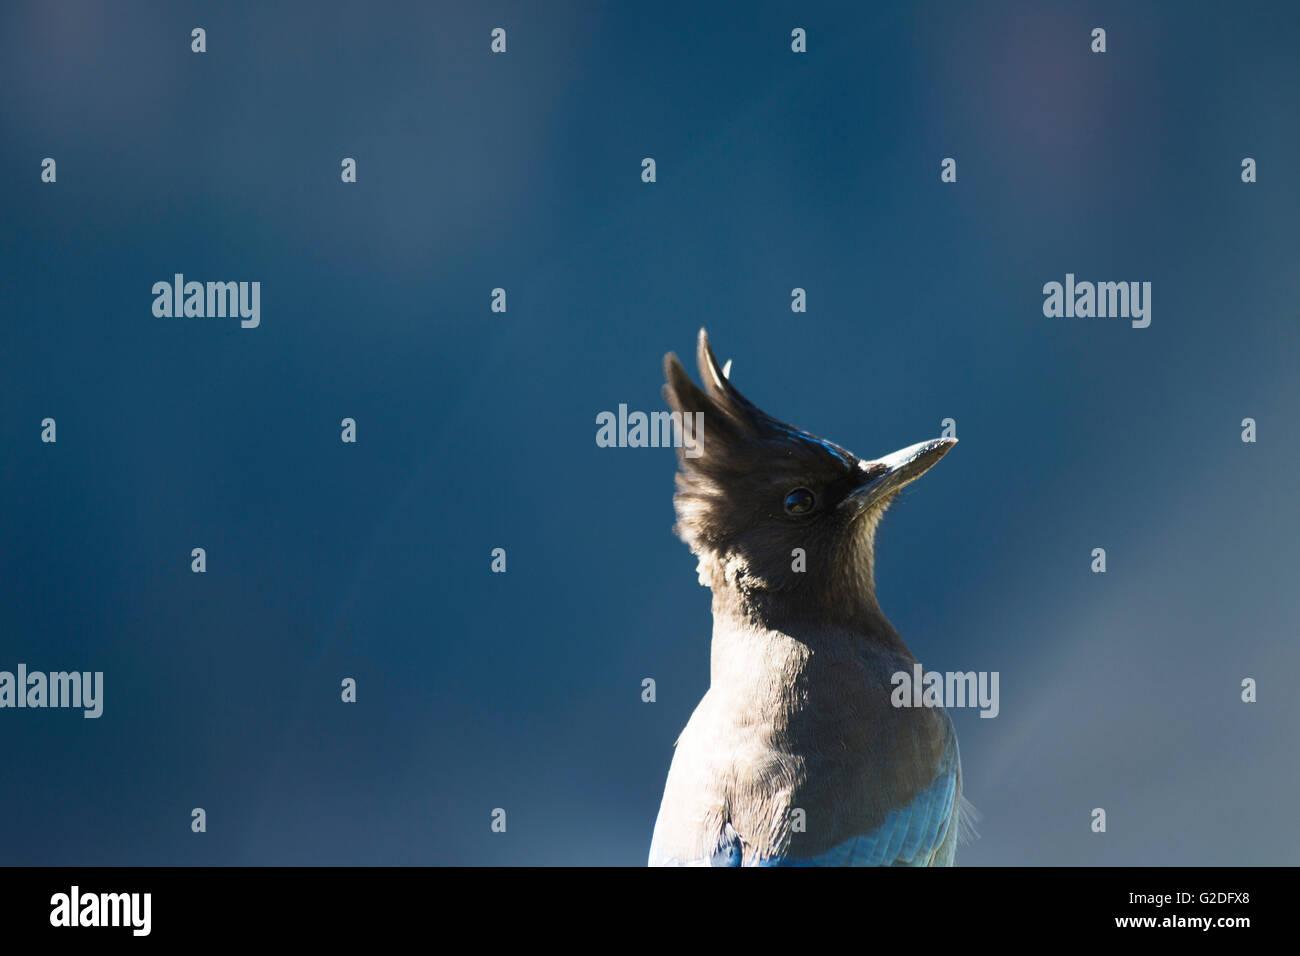 Stellar Blue Jay - Stock Image